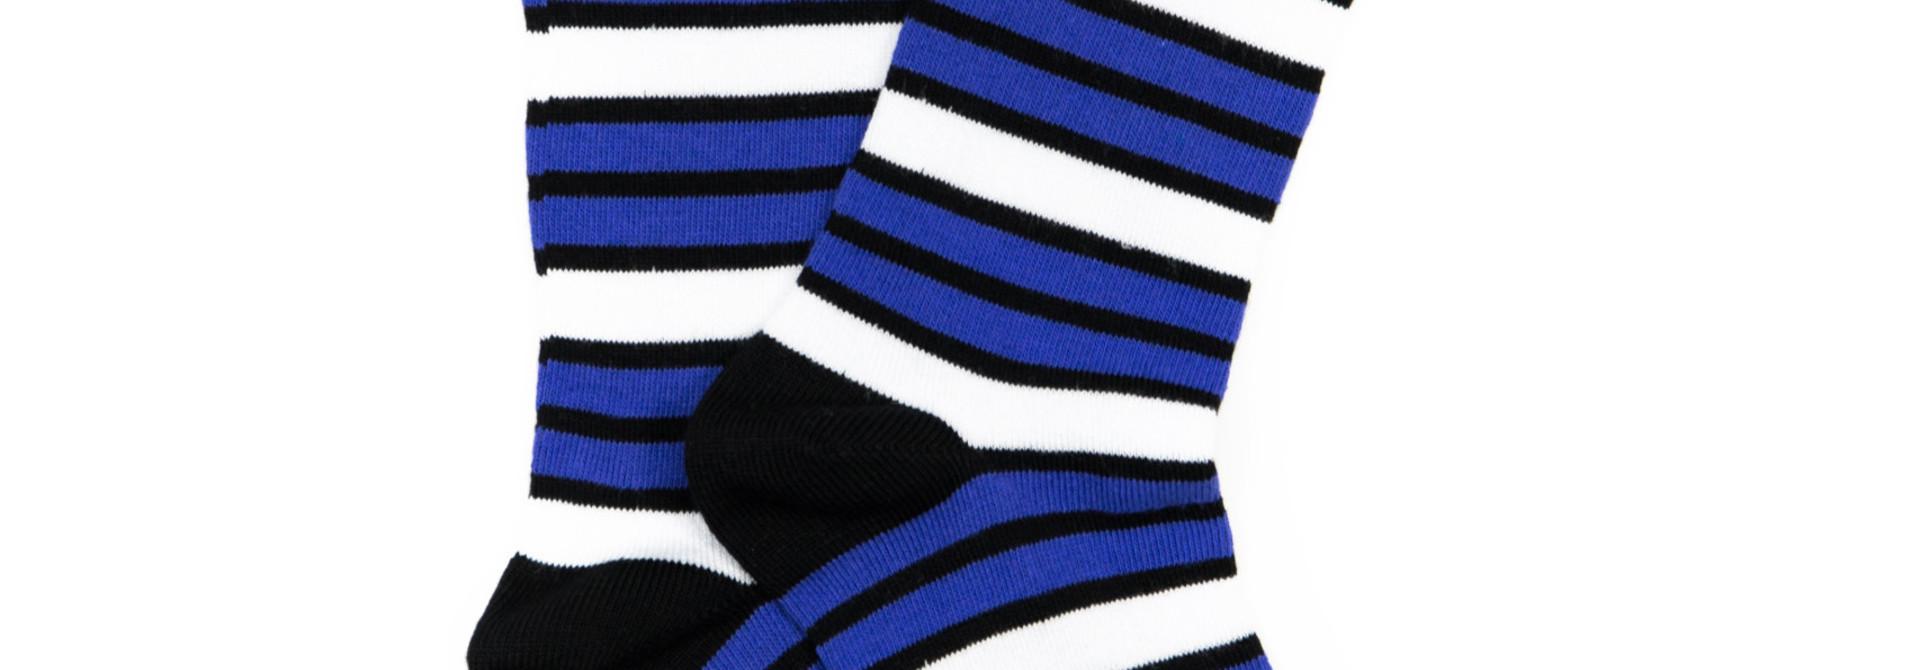 Playa Socks